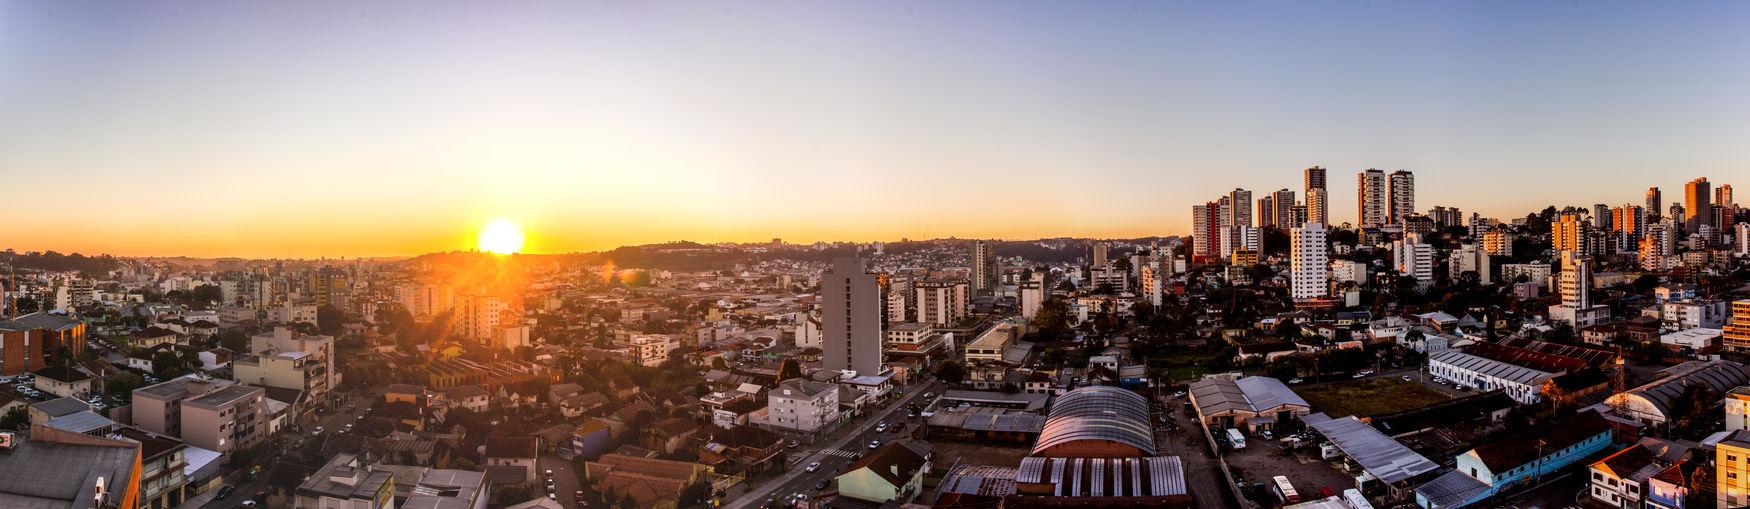 Good View! #beautiful #like #post #love #simple #enjoy #followback #beautifulday #biuldings #home #panoramicview #sky #sun #sunset